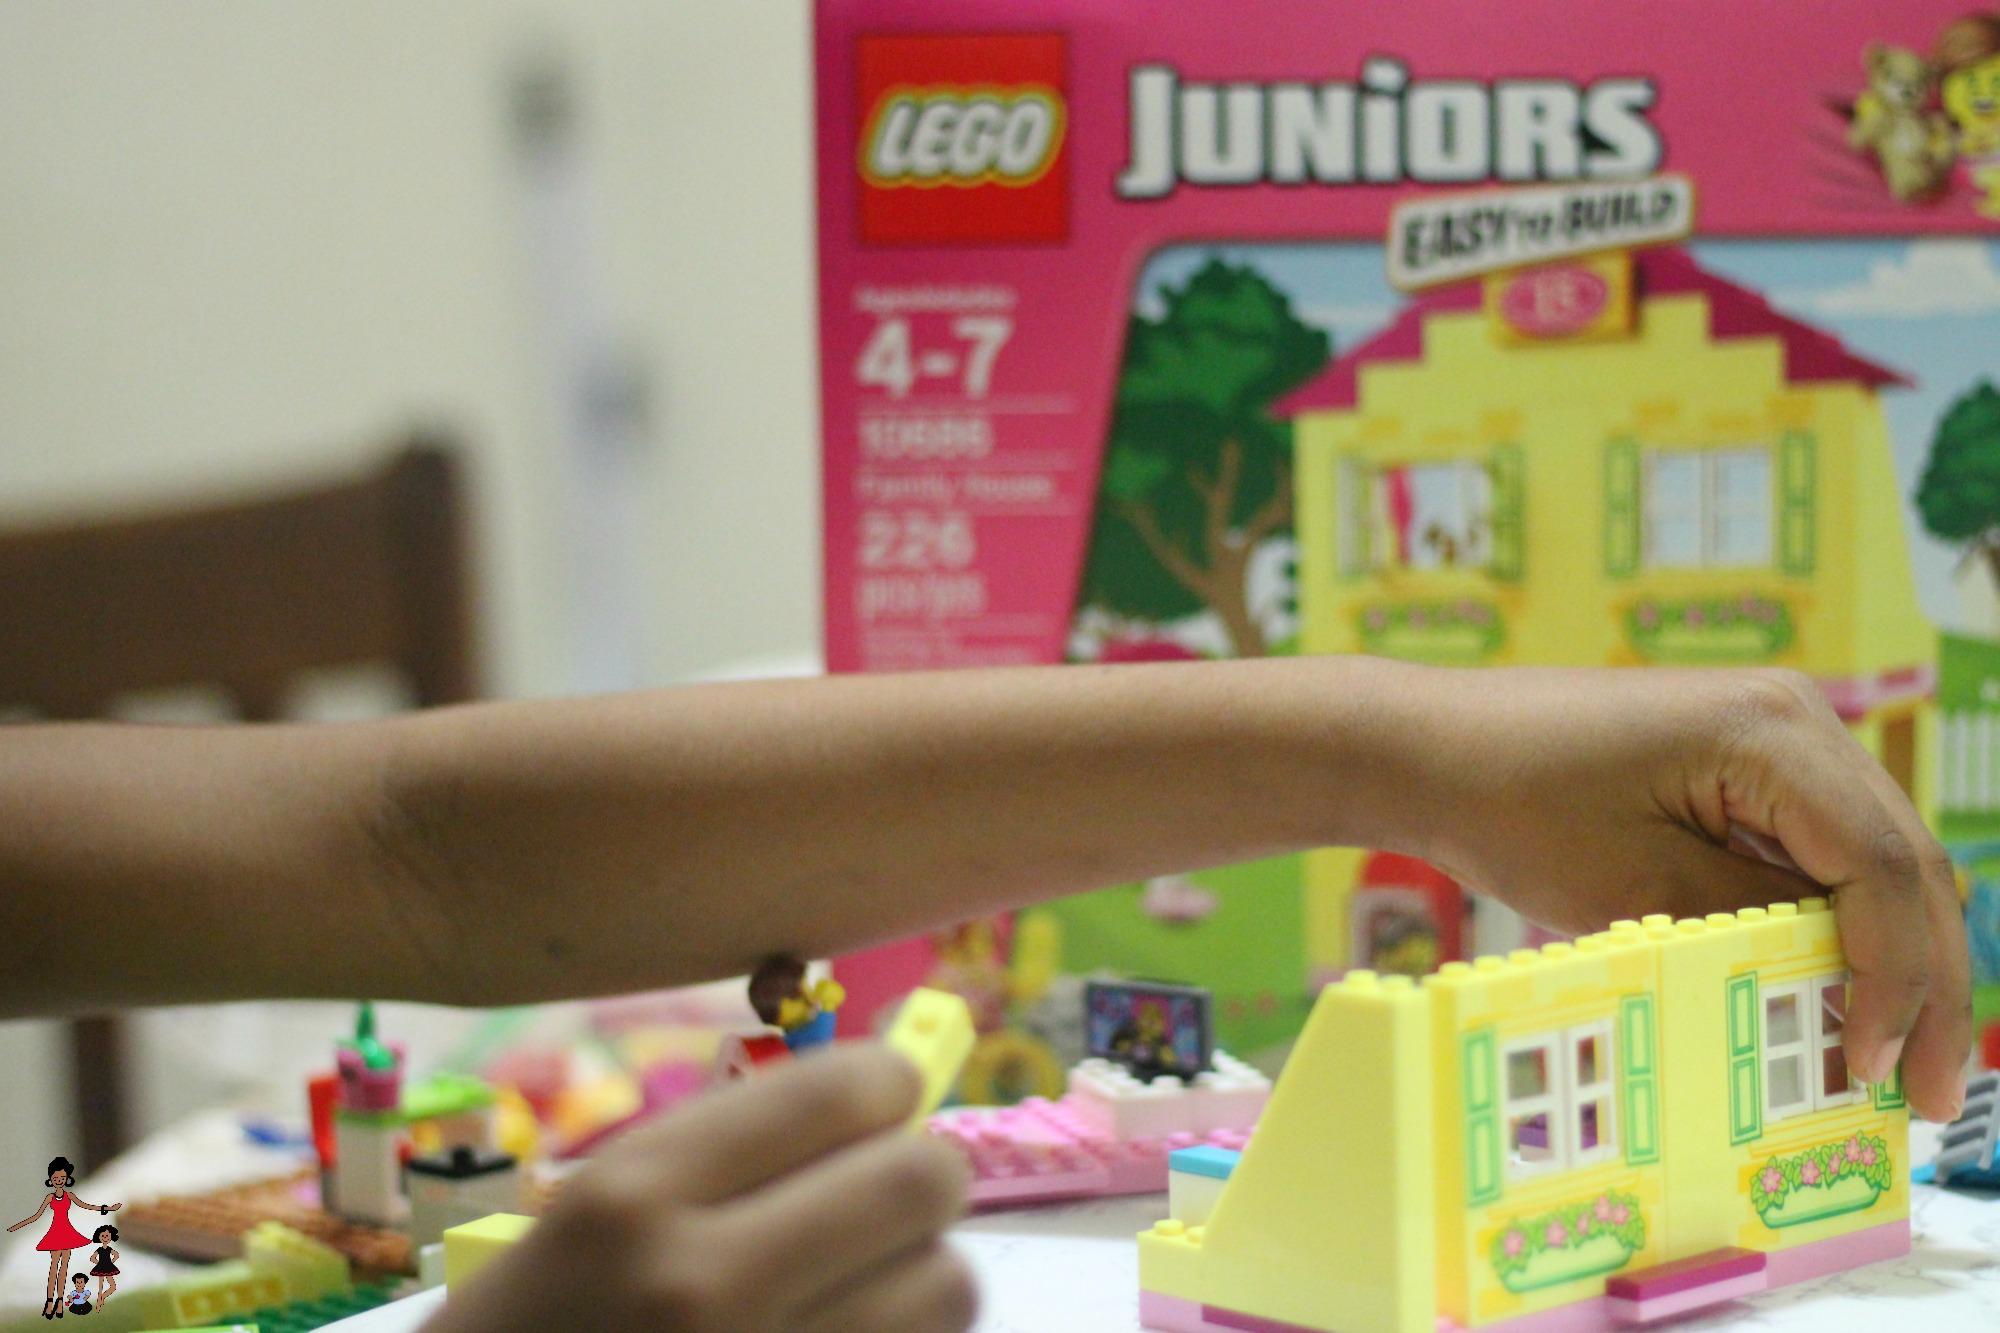 lego-juniors-celebrate-small-wins